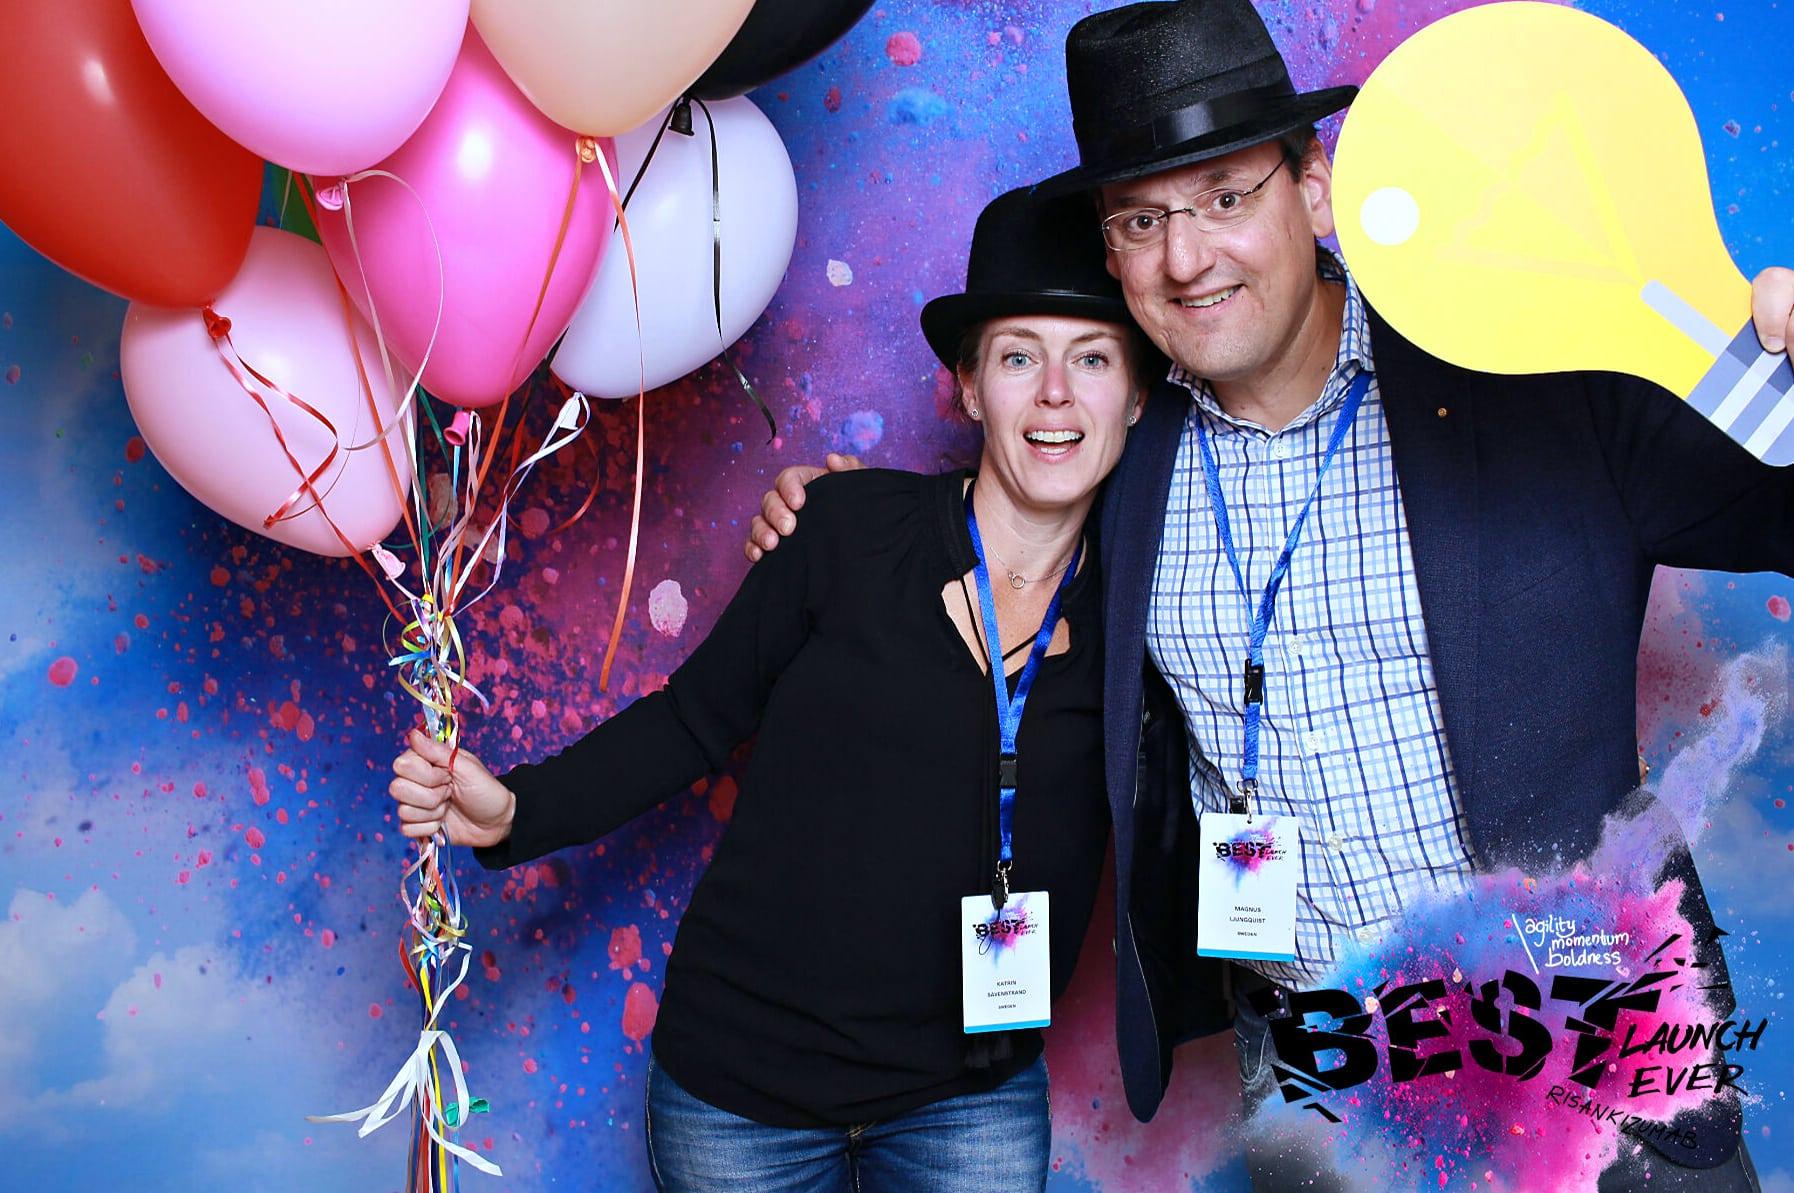 fotokoutek-best-launch-ever-25-6-2018-445698